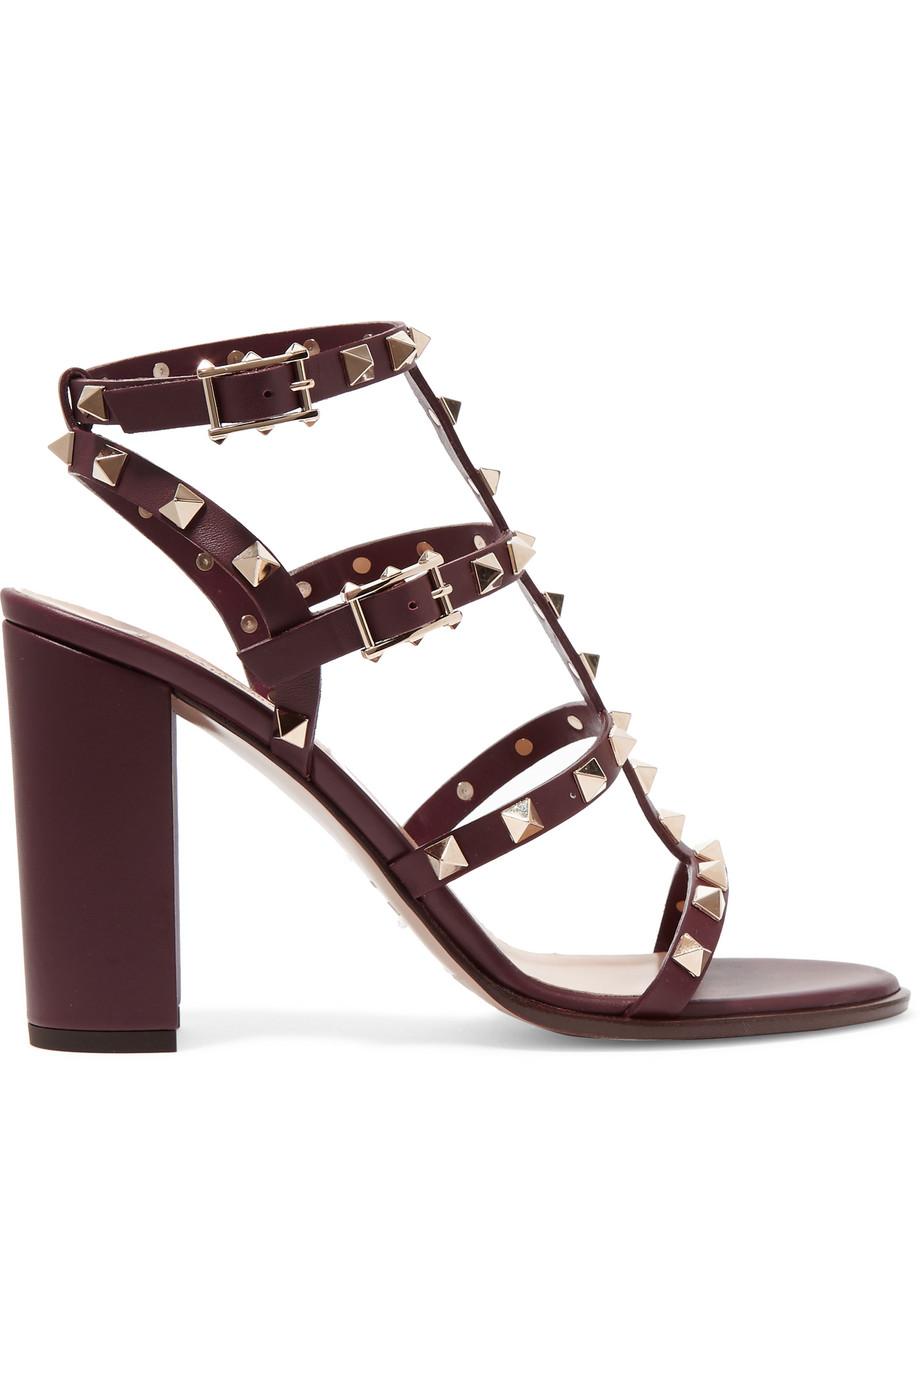 Valentino The Rockstud Embellished Leather Sandals, Burgundy, Women's US Size: 4.5, Size: 35